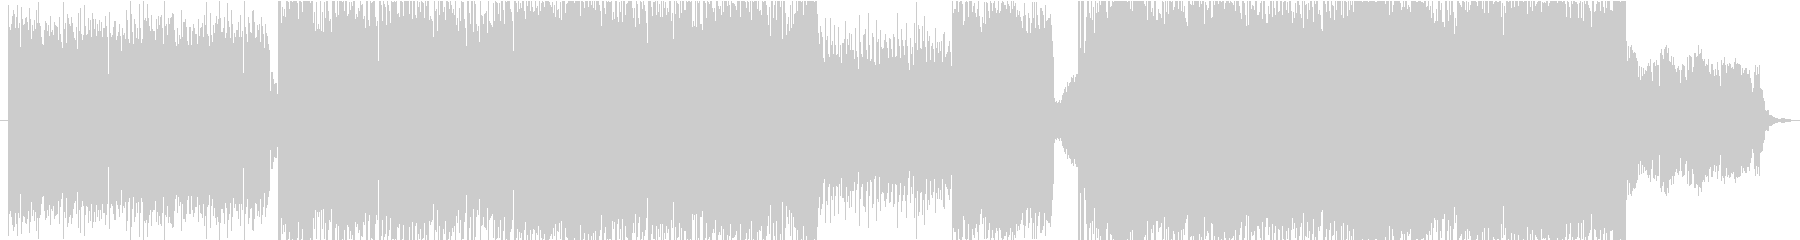 Horn メロが印象的なBGMの未再生の波形